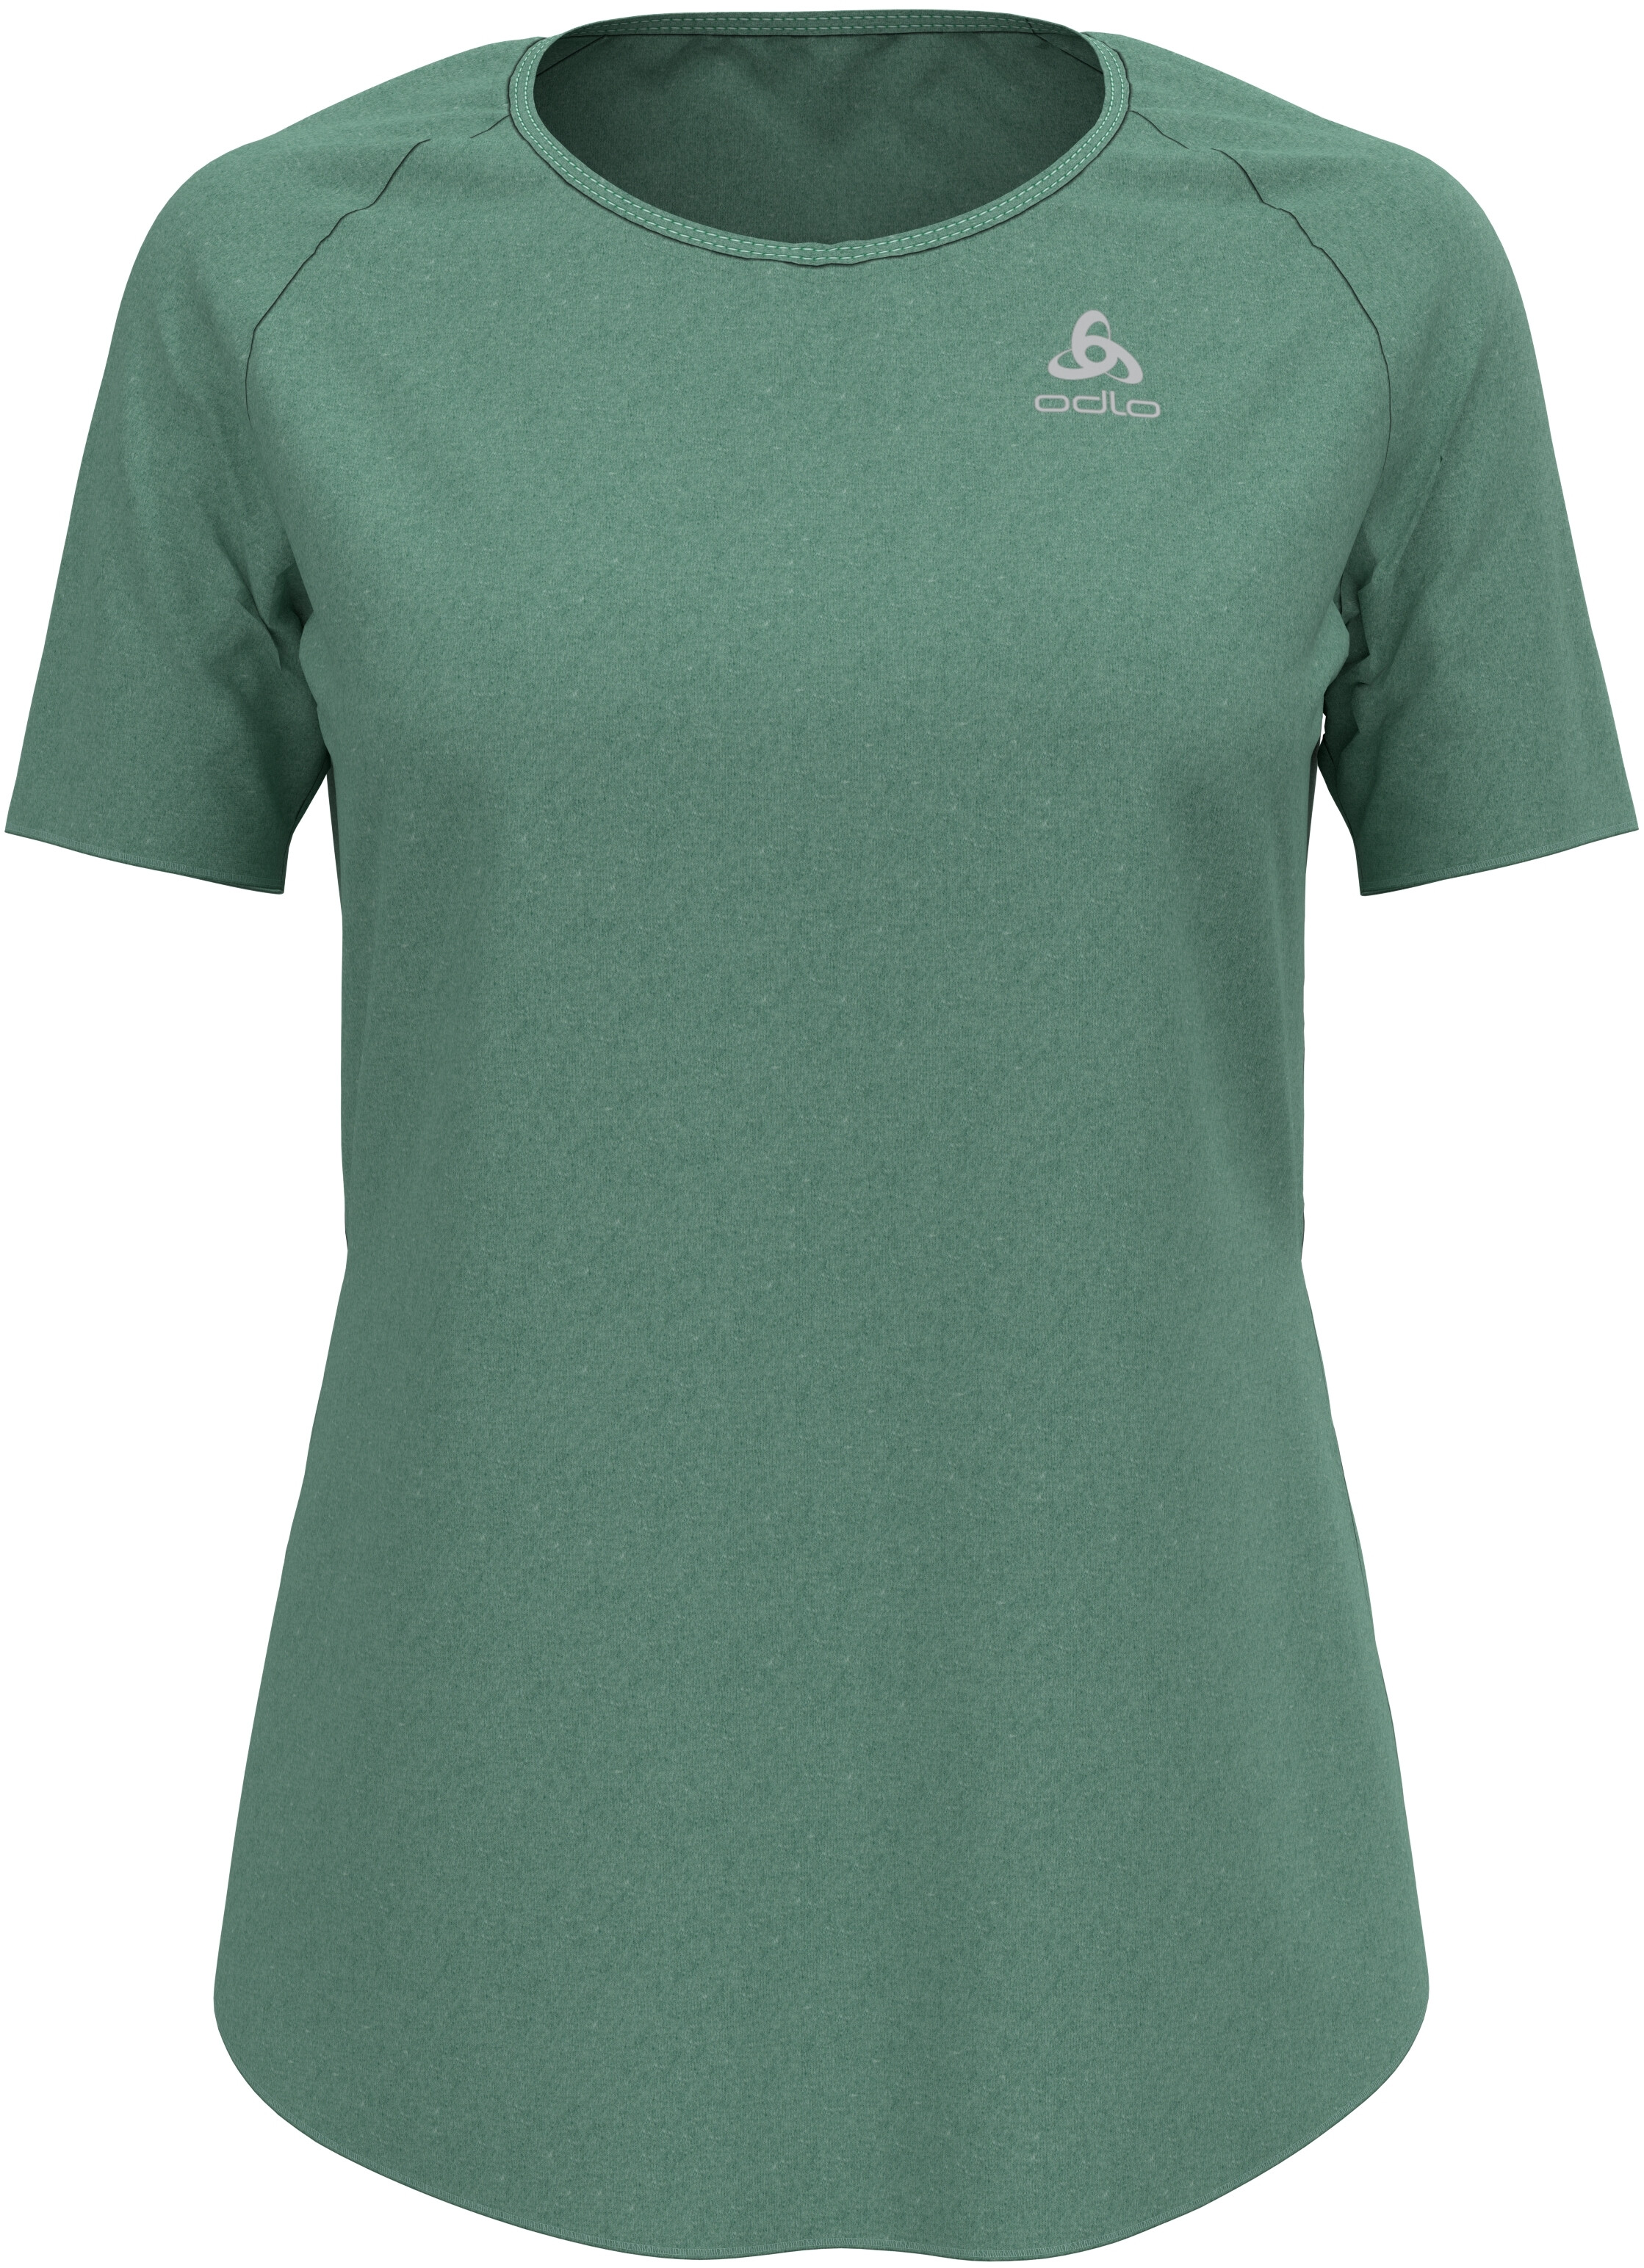 Femme Odlo Millennium Element T-Shirt